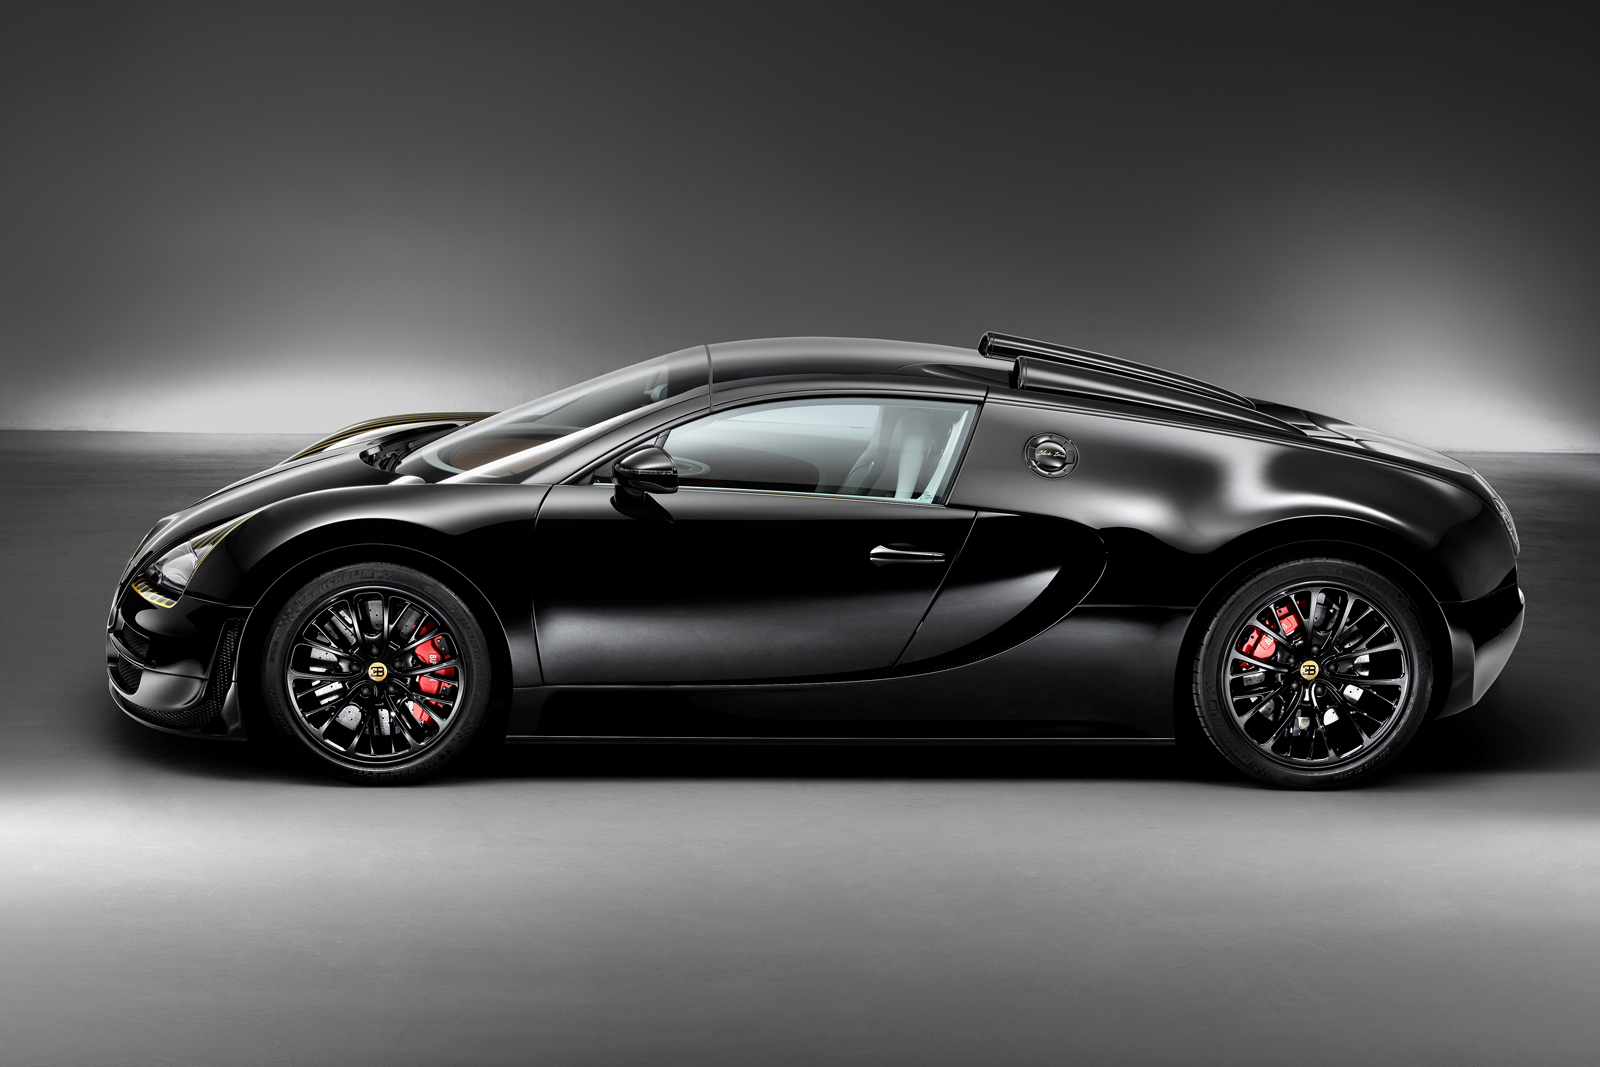 Bugatti Veyron Quot Black Bess Quot Mixes Gold Aviation And